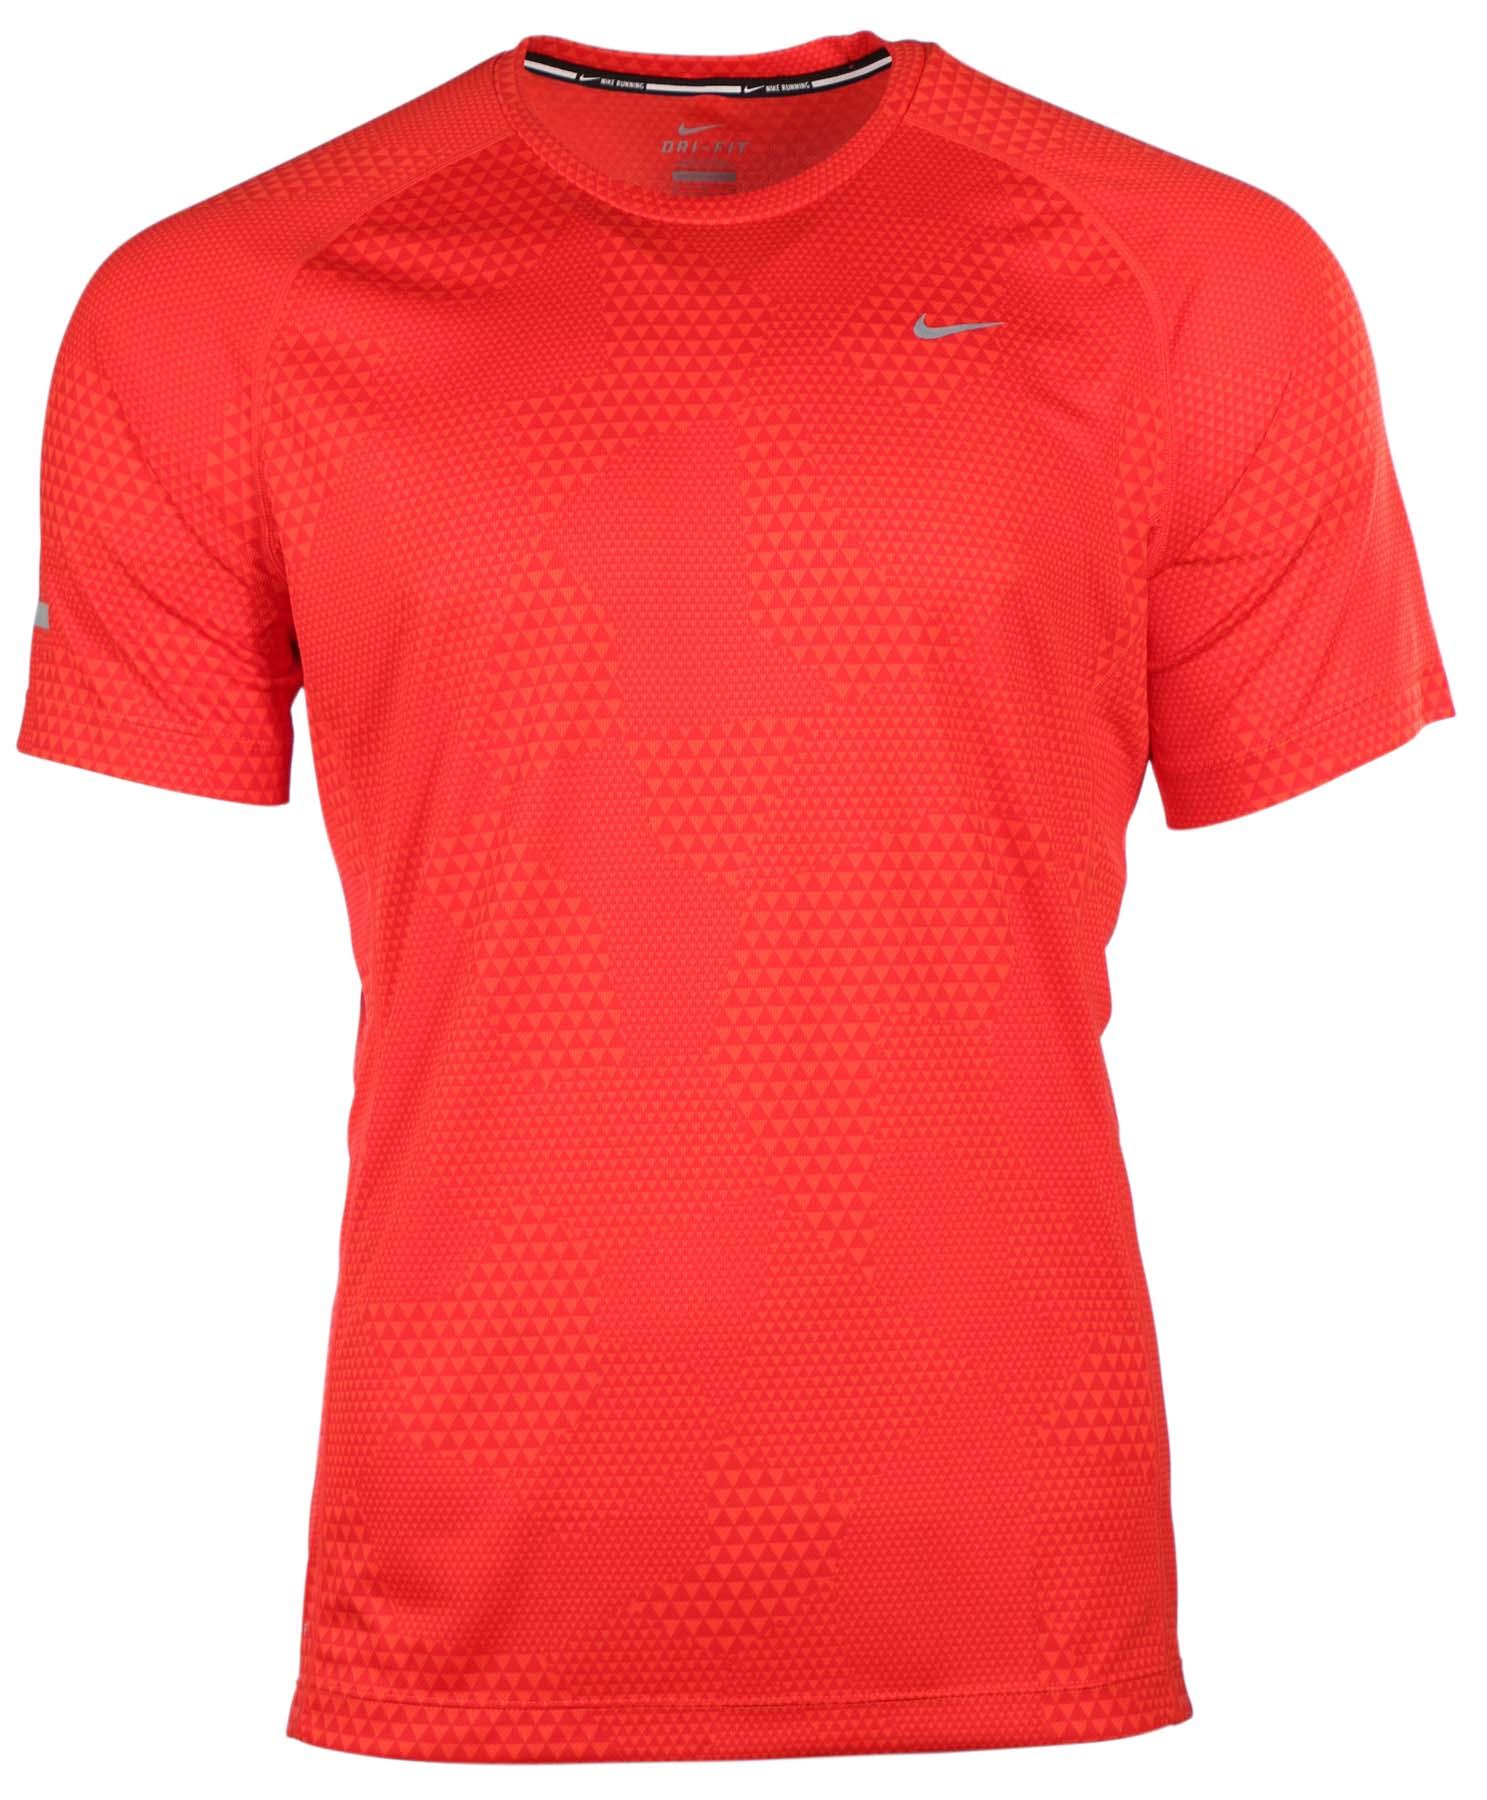 Nike Men 39 S Dri Fit Geo Printed Miler Running Shirt Ebay